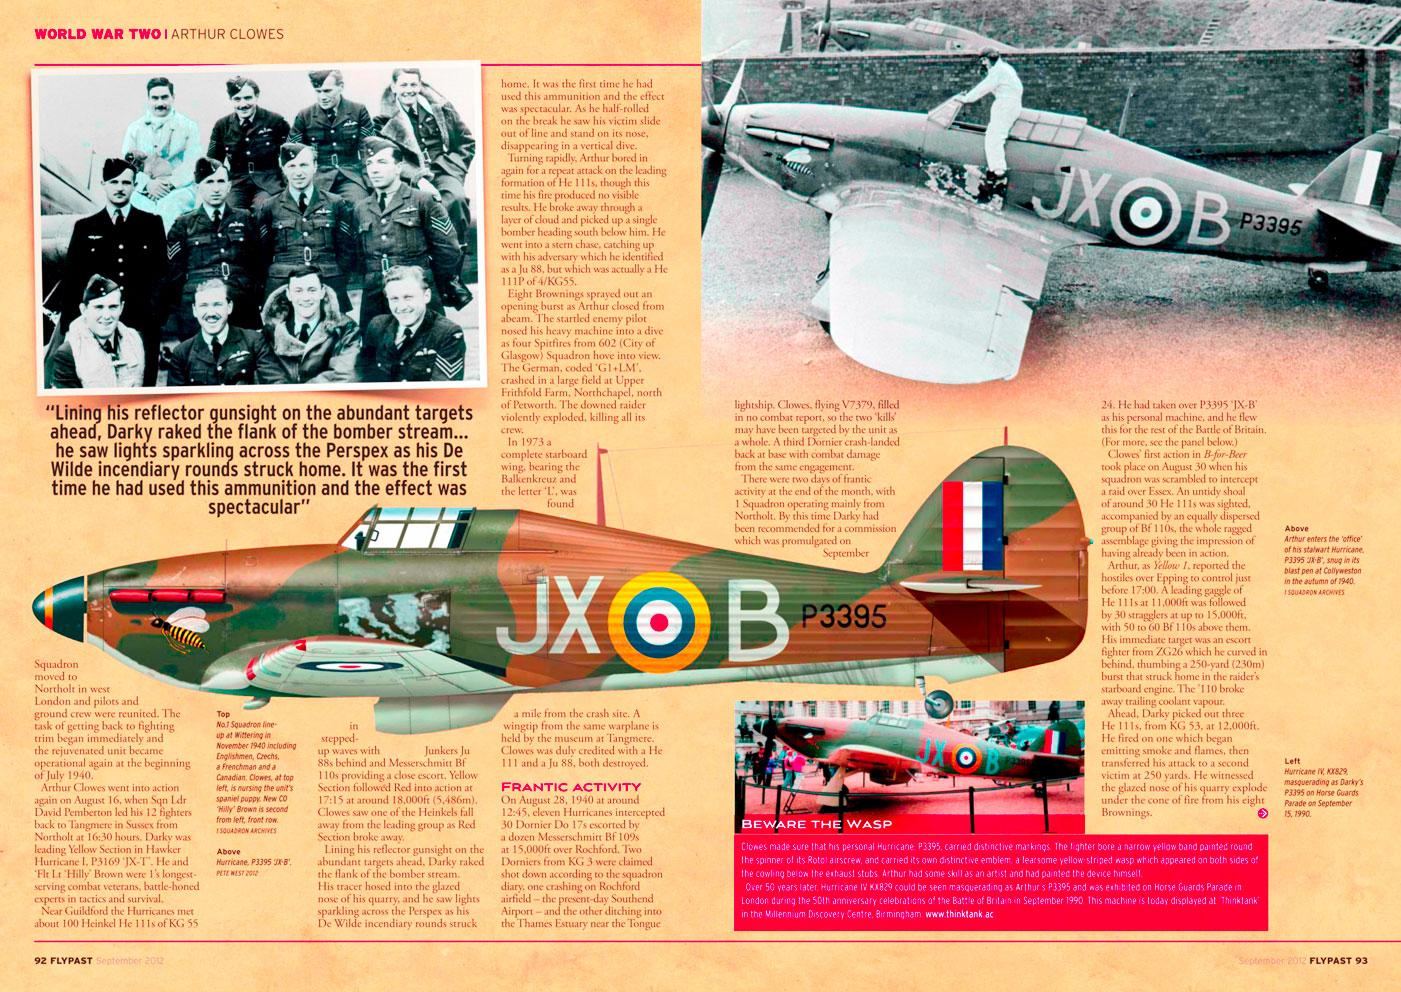 Hawker Hurricane I RAF 1Sqn JXB Arthur V Clowes P3395 England 1940 0A